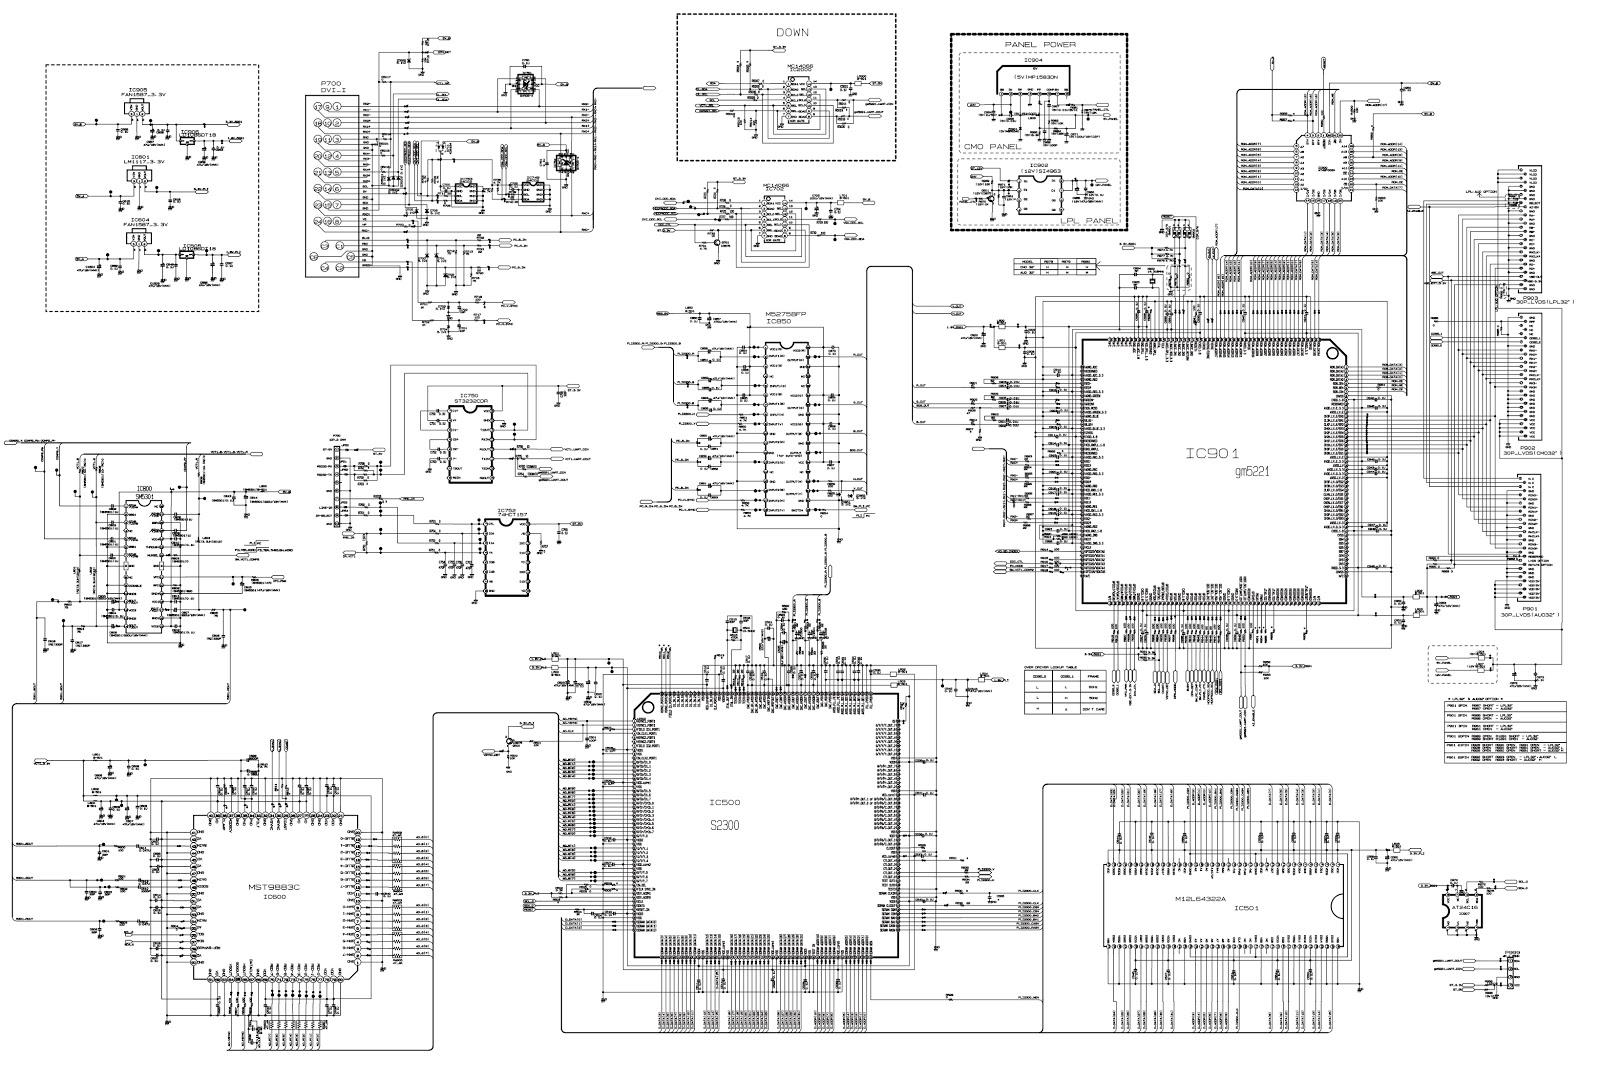 medium resolution of lg rz23lz55 lcd tv schematic circuit diagram schematic diagrams rh schematicscom blogspot com